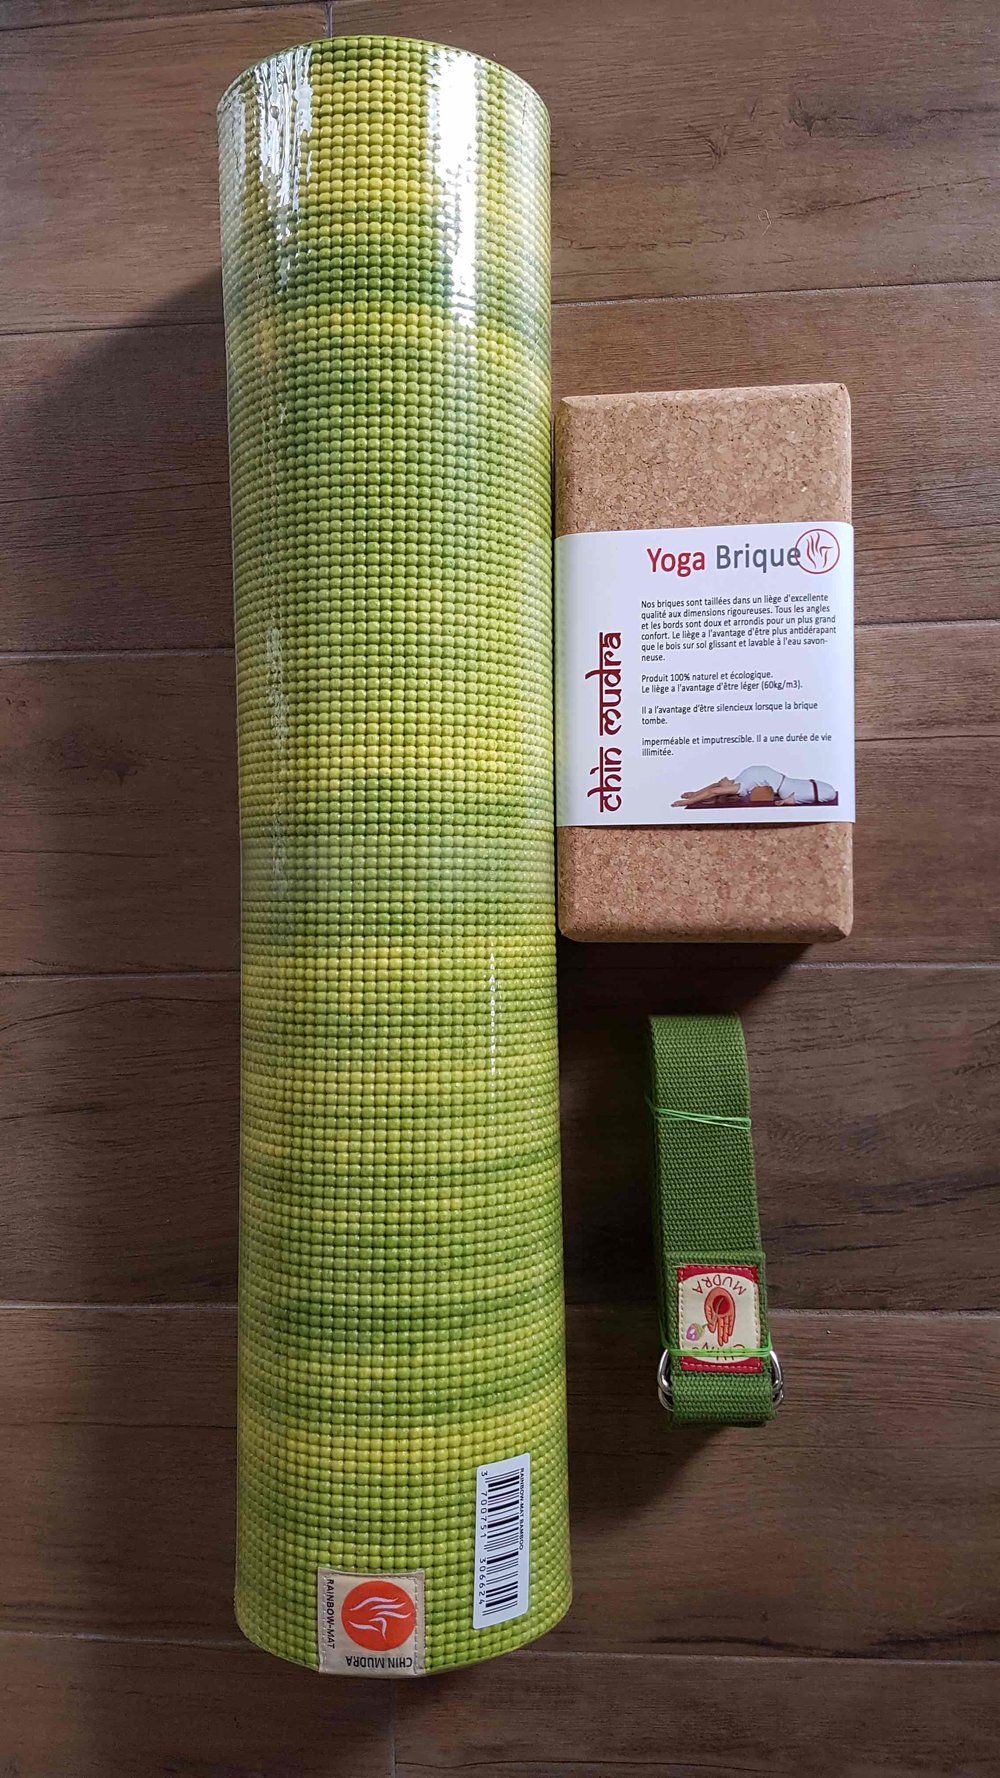 Kit Bois vert - 1 tapis vert citron + 1 sangle verte + 1 bloc liège : 59€TTC